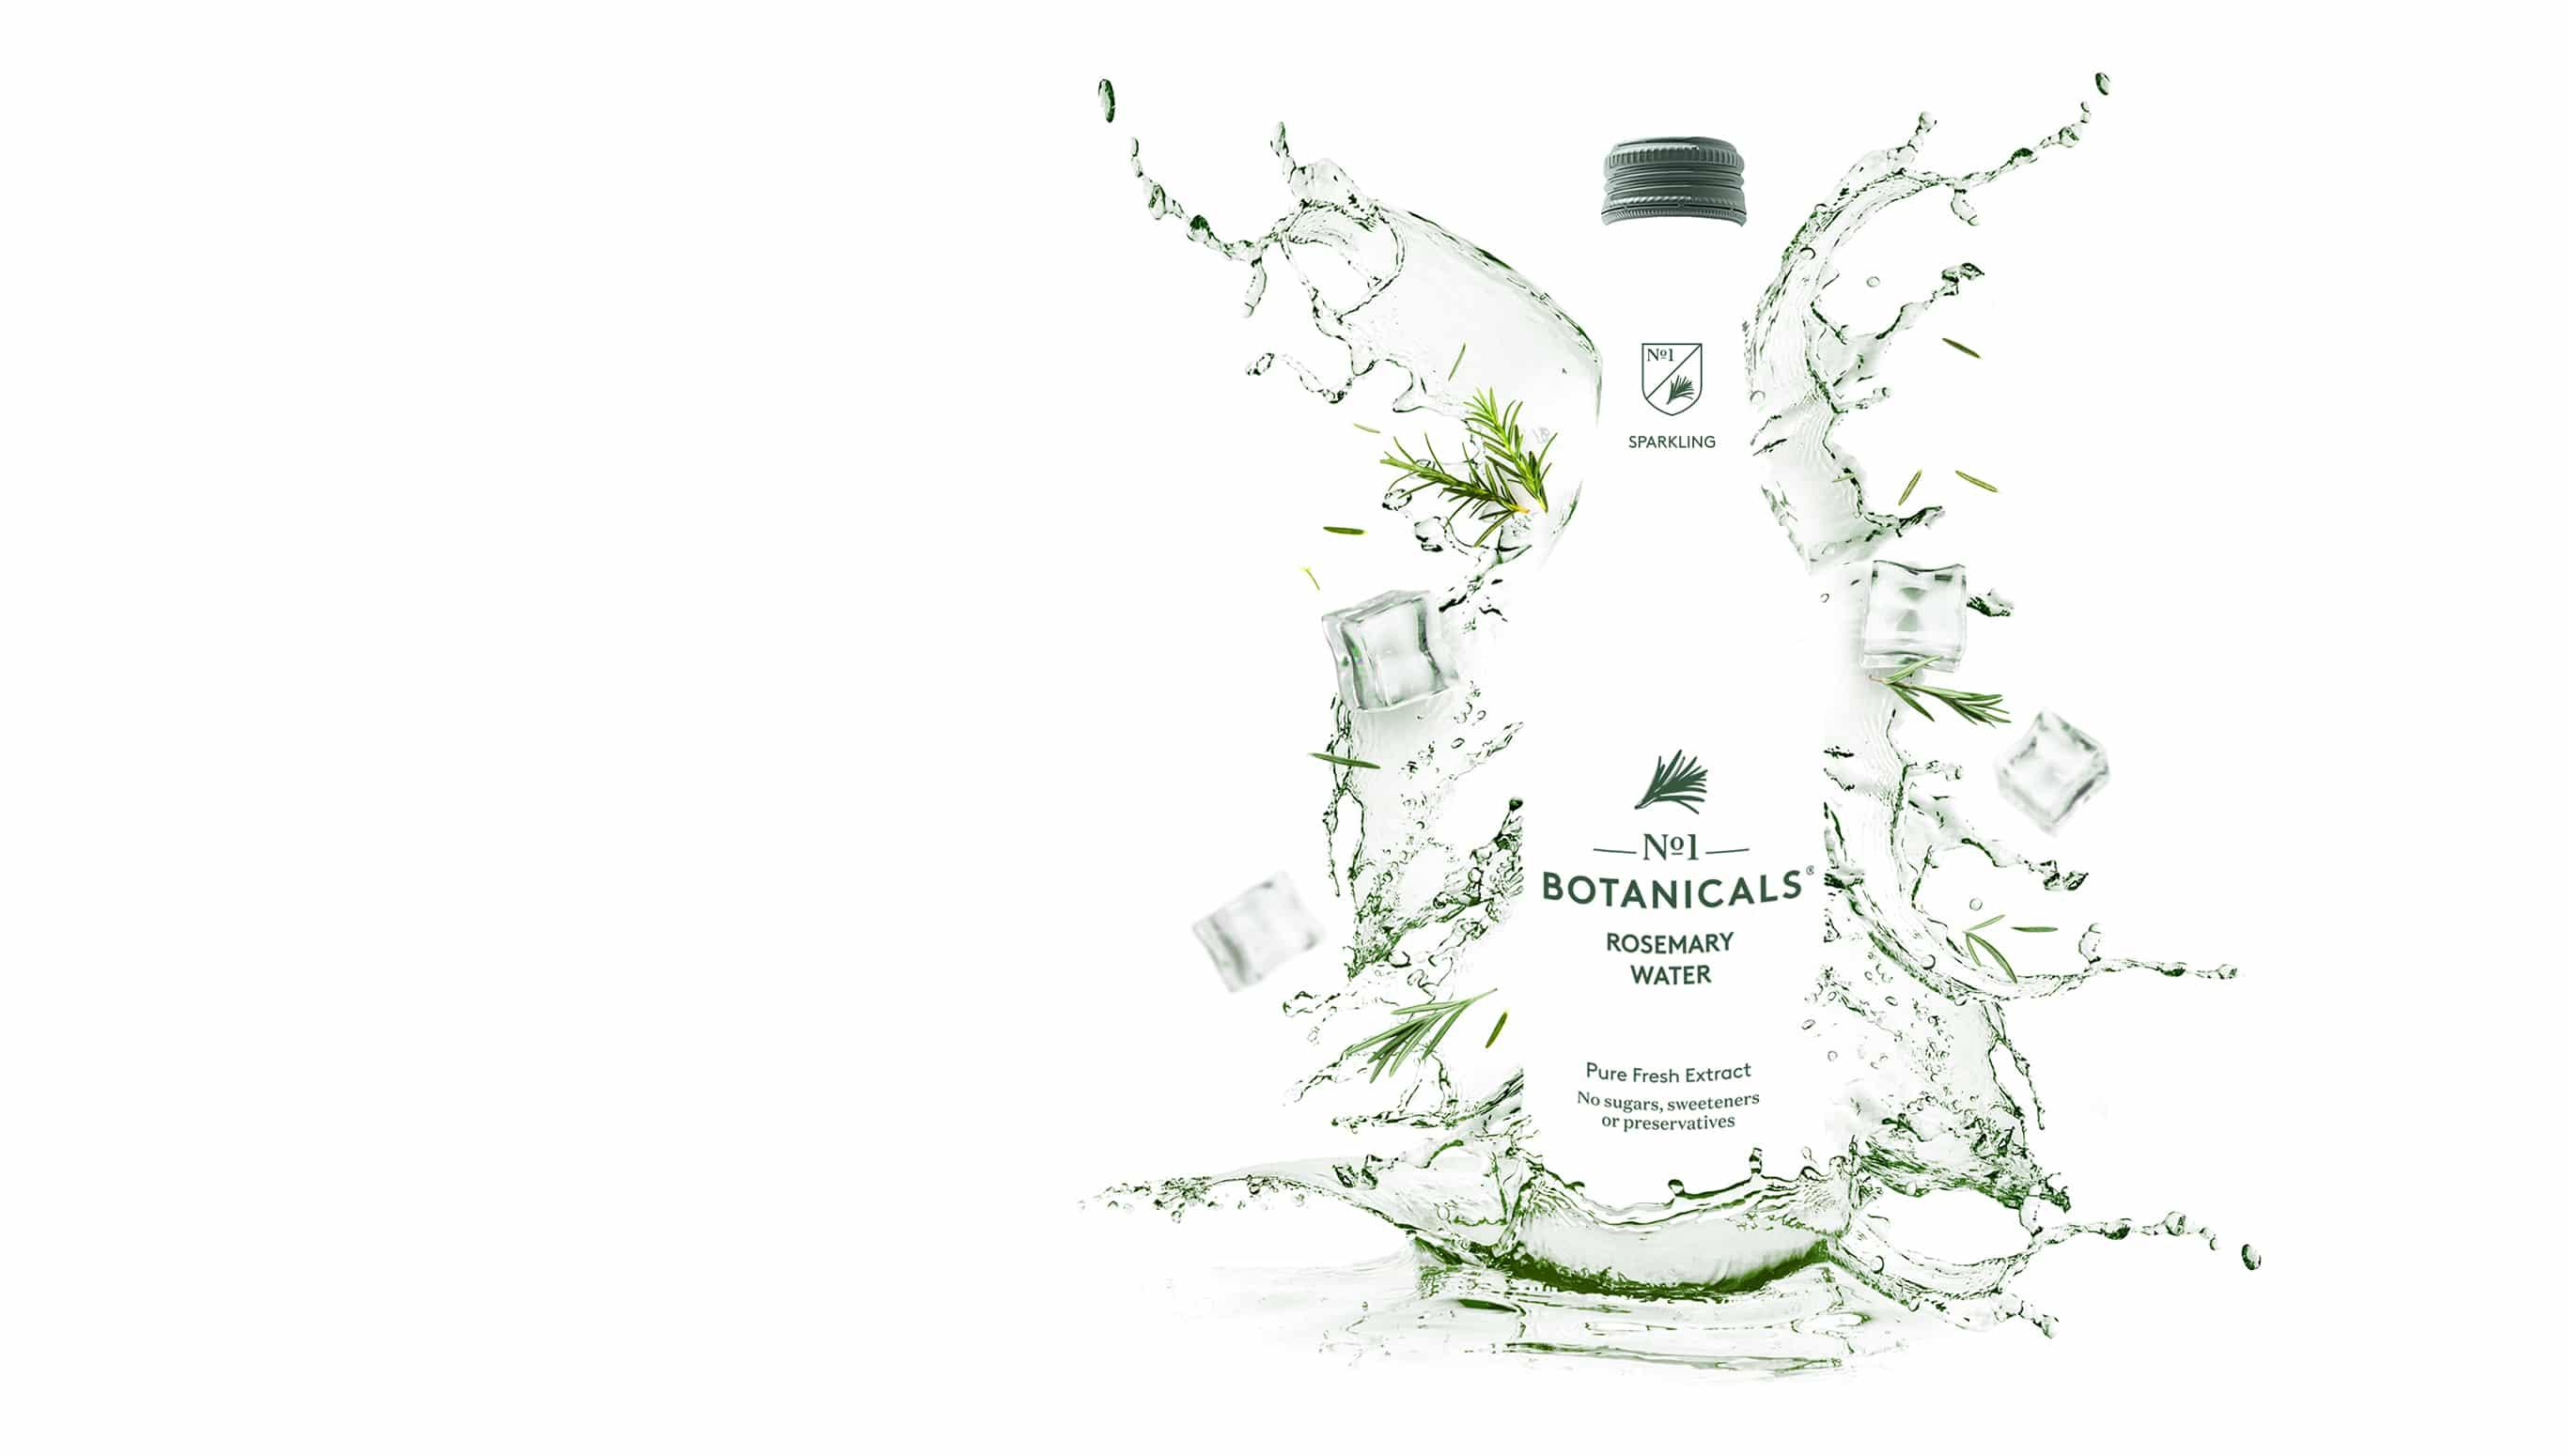 Brand visual for No1 Botanicals created by Davison Williams